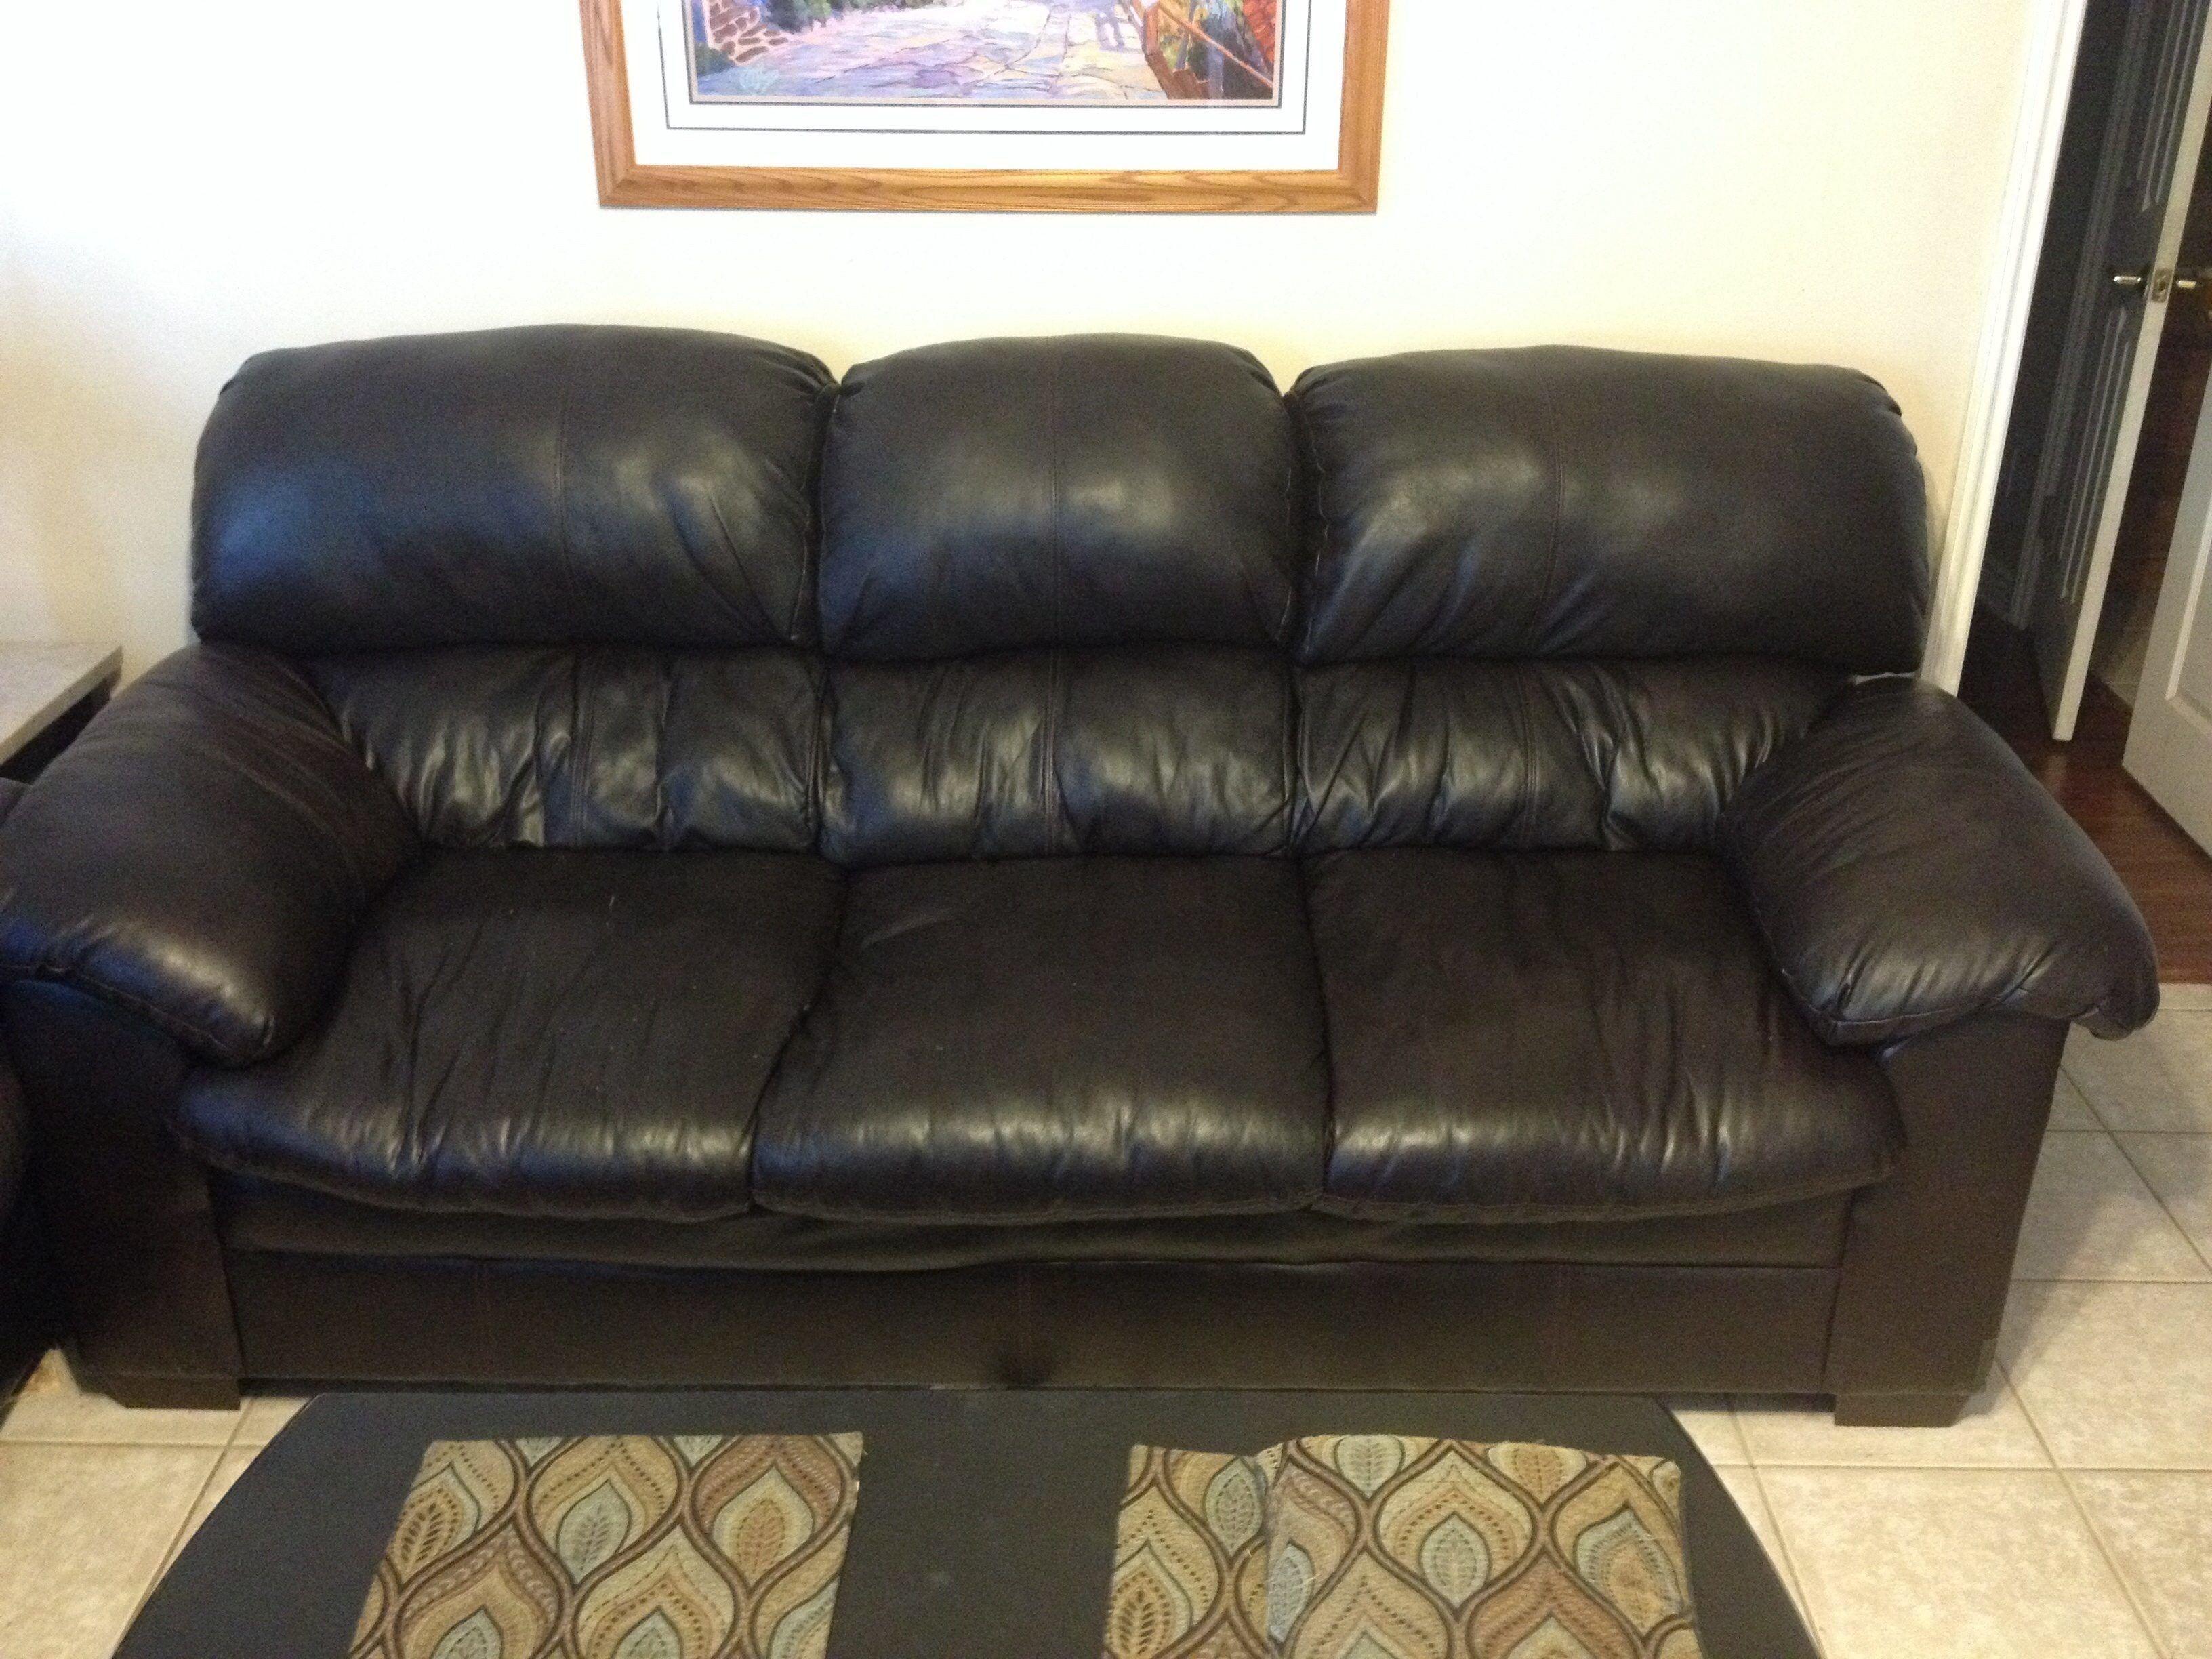 30 big lots living room chairs